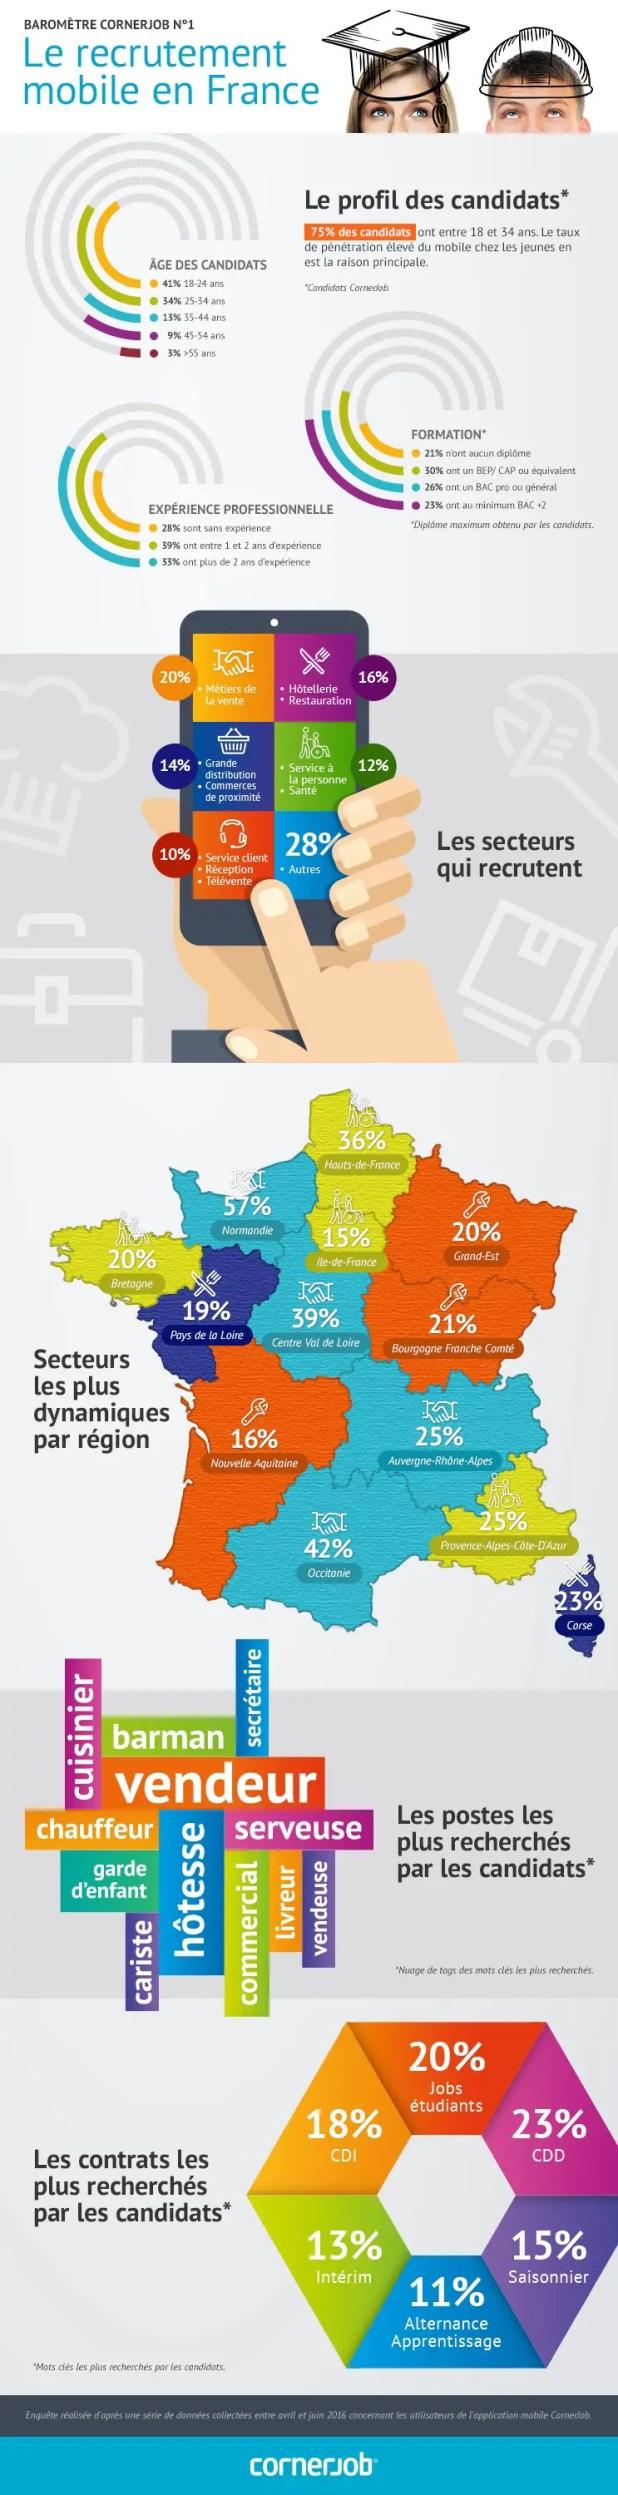 cornerjob-infographie-jupdlc